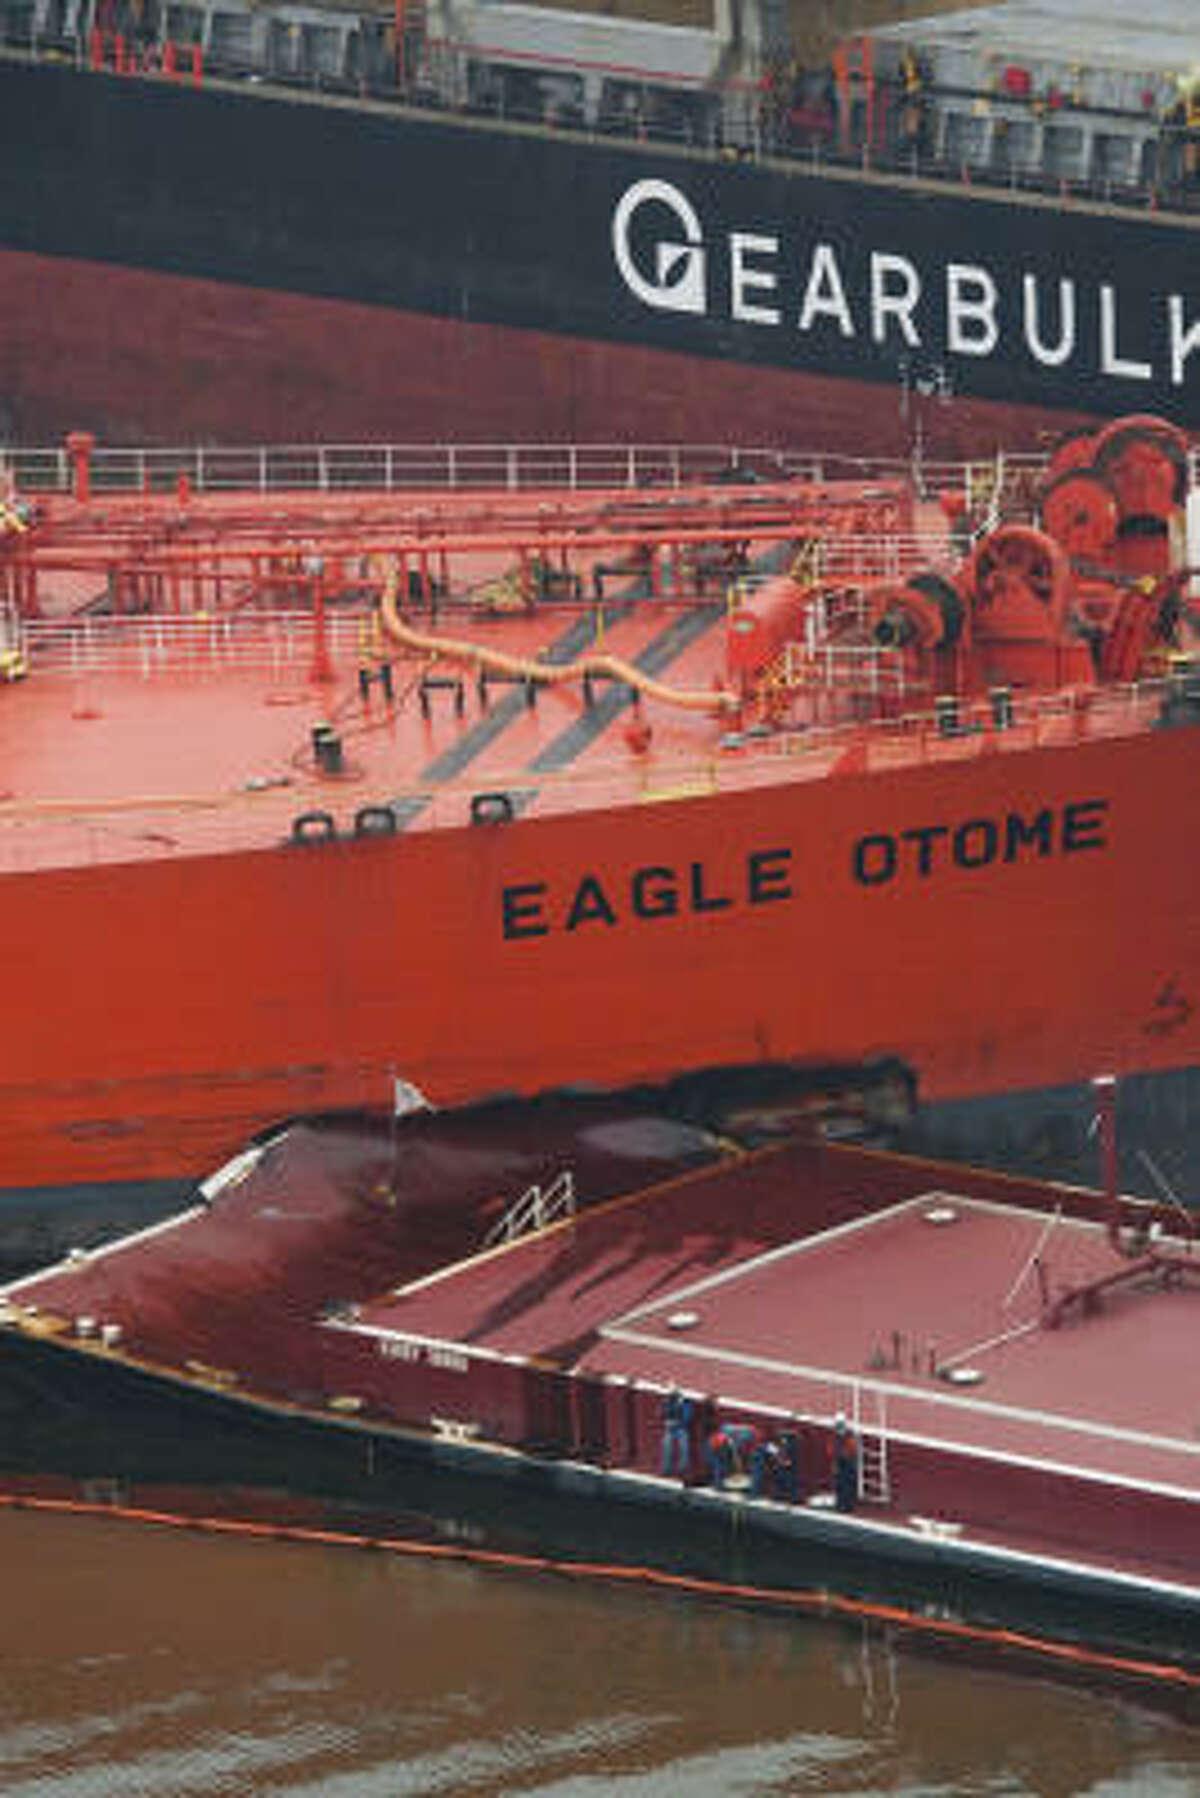 The crash leaves a gash on the Eagle Otome, a 600-foot tank ship.